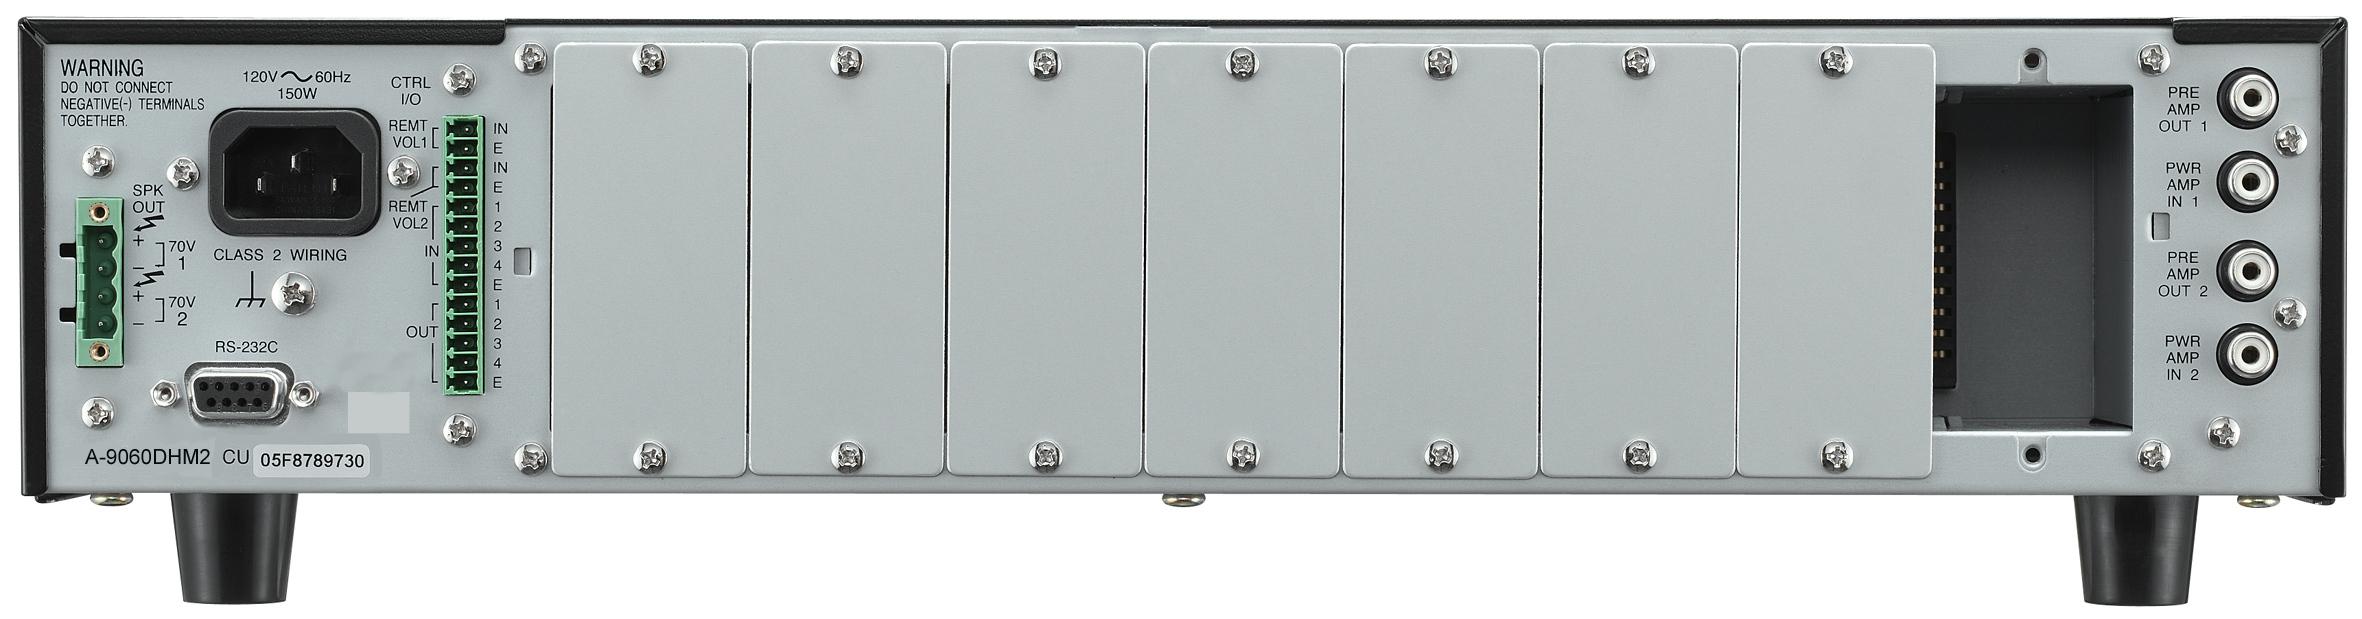 Modular Mixer Amp 1x120W 25/70V, 4/8ohms